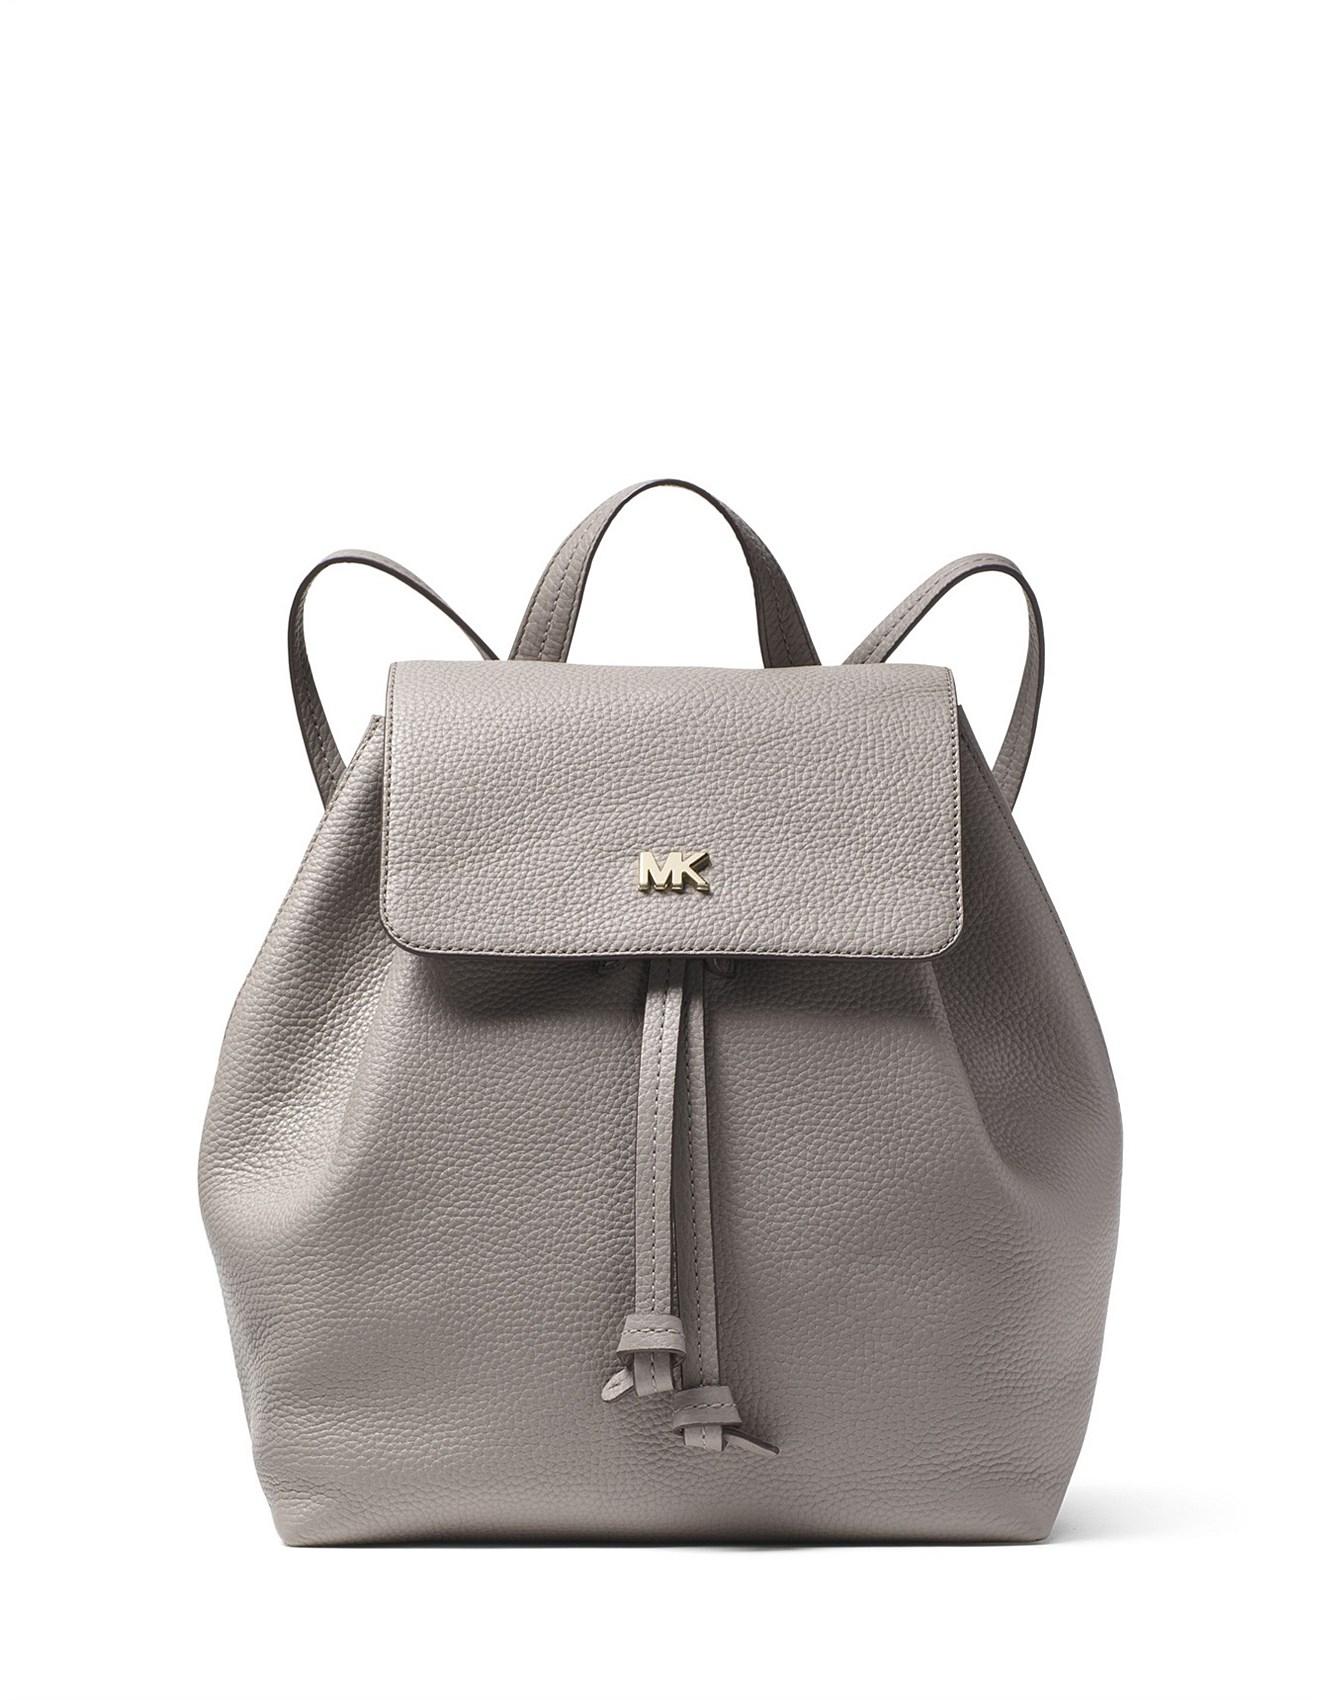 d071a863cd2a Women - Junie Medium Pebbled Leather Backpack